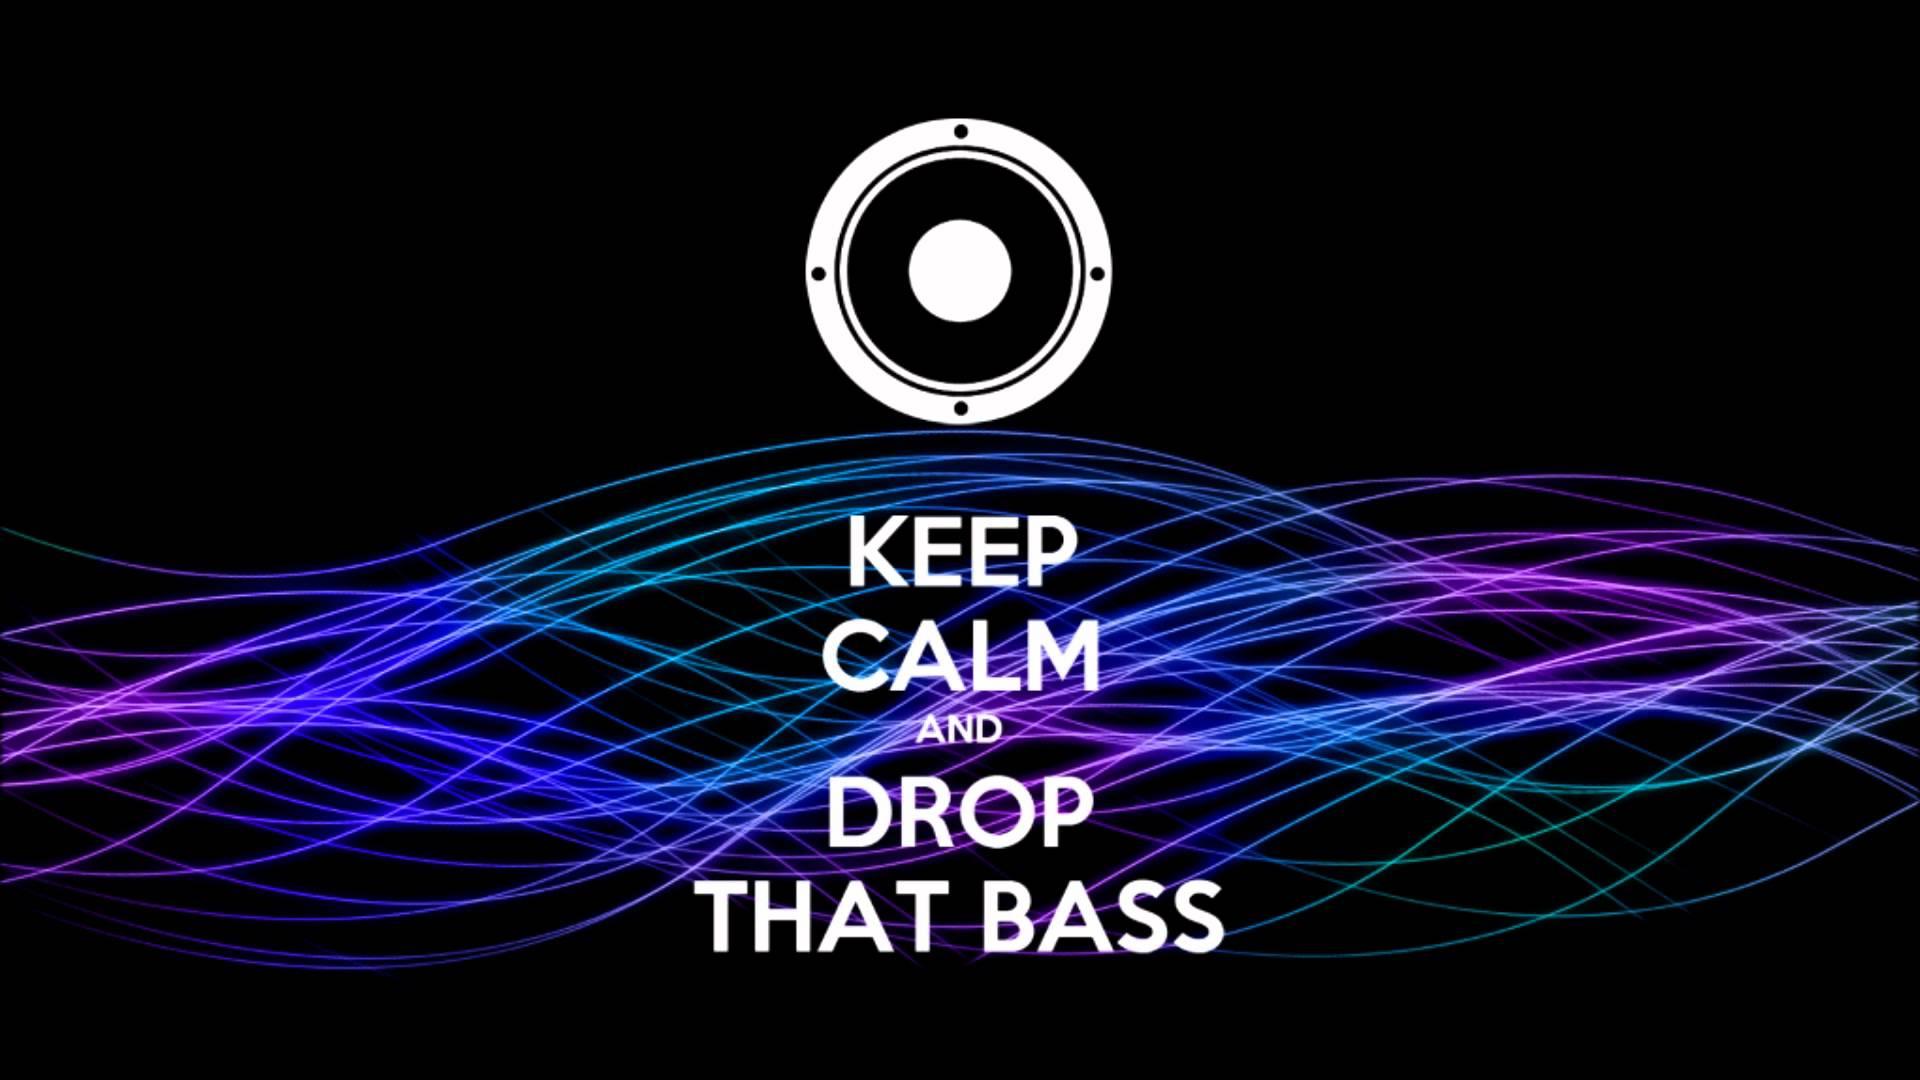 Keep Calm and Drop The Bass wallpaper | 1920x1080 | #9395